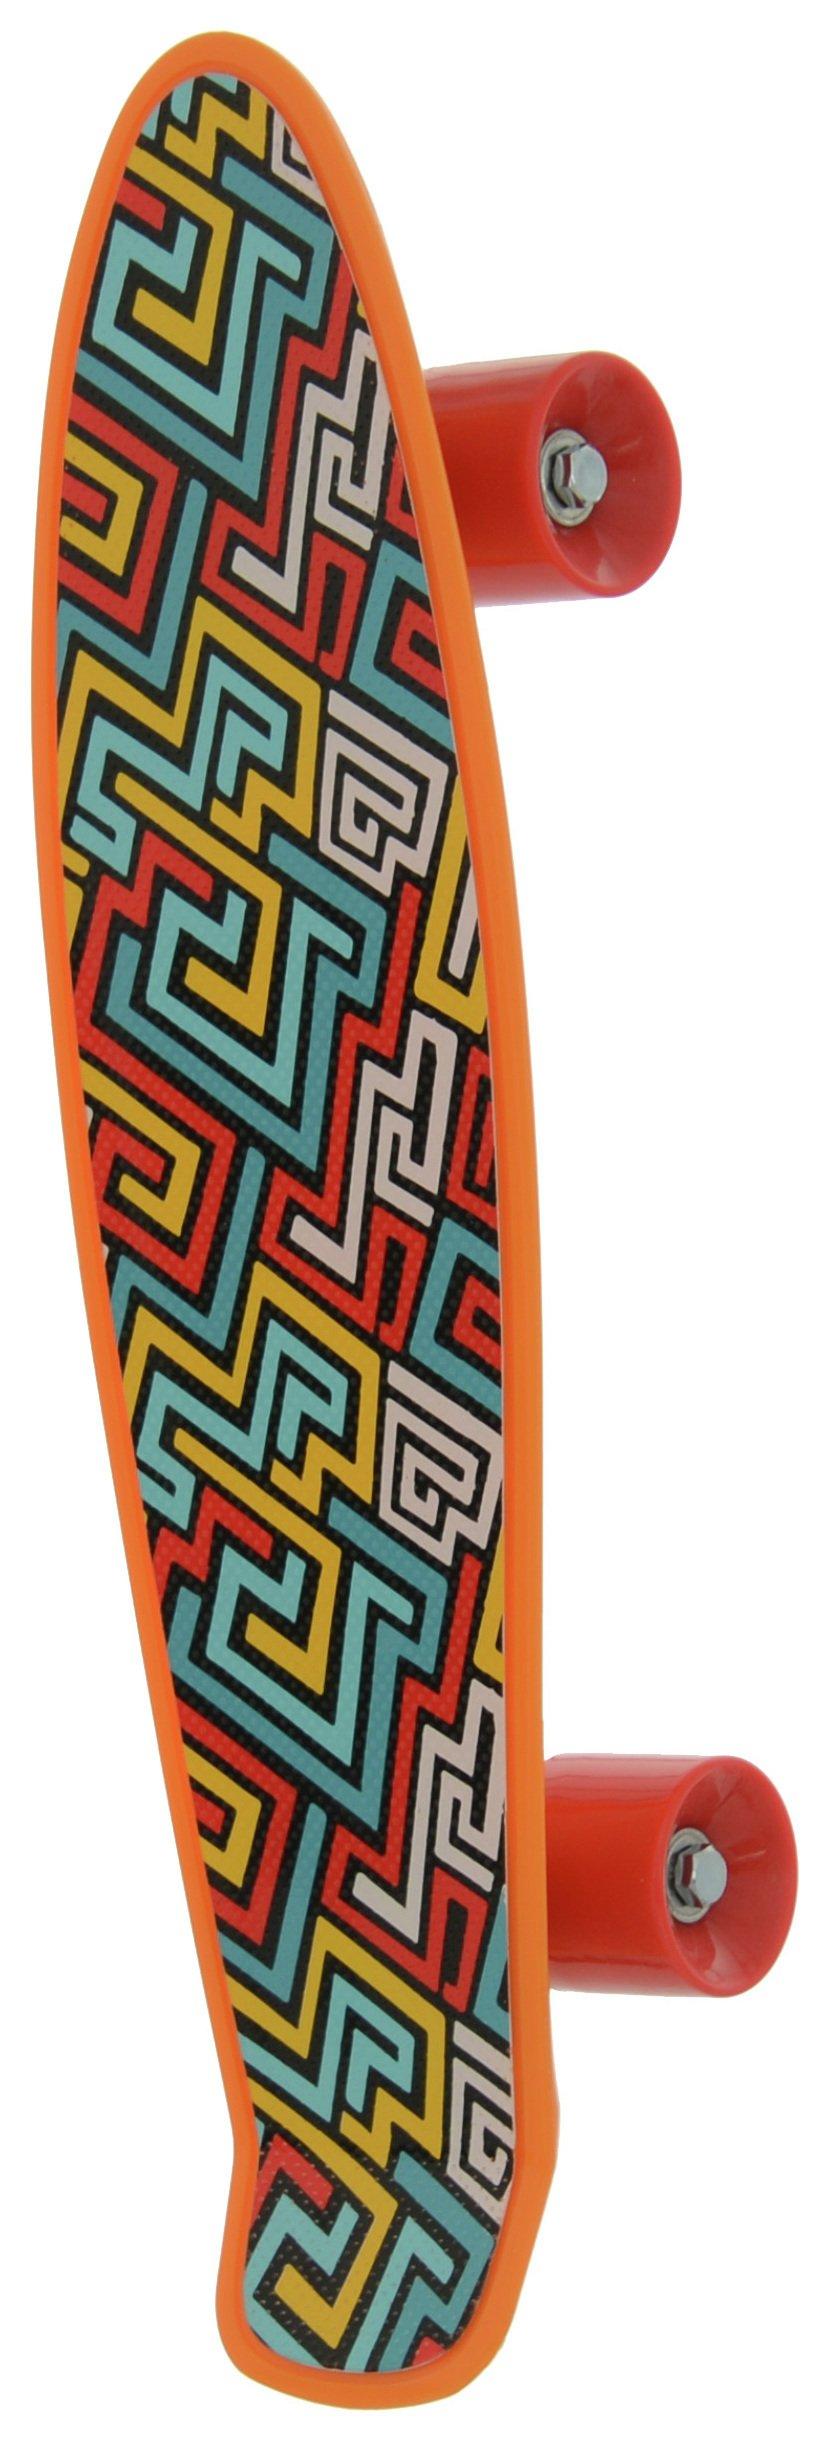 Image of Bored - Neon X Skateboard - Aztec